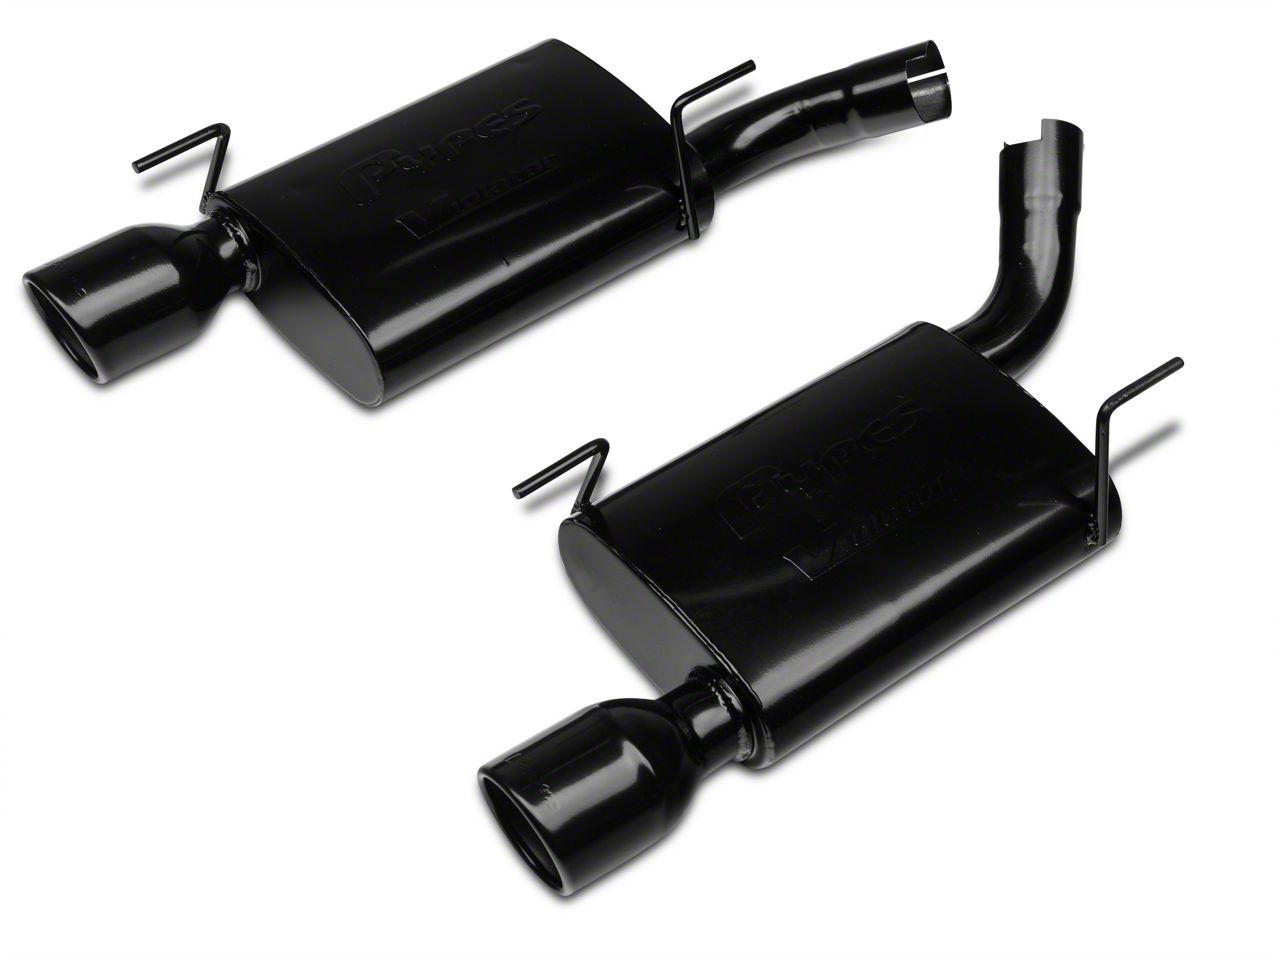 Pypes Violator Axle-Back Exhaust - Black (05-10 GT, GT500)